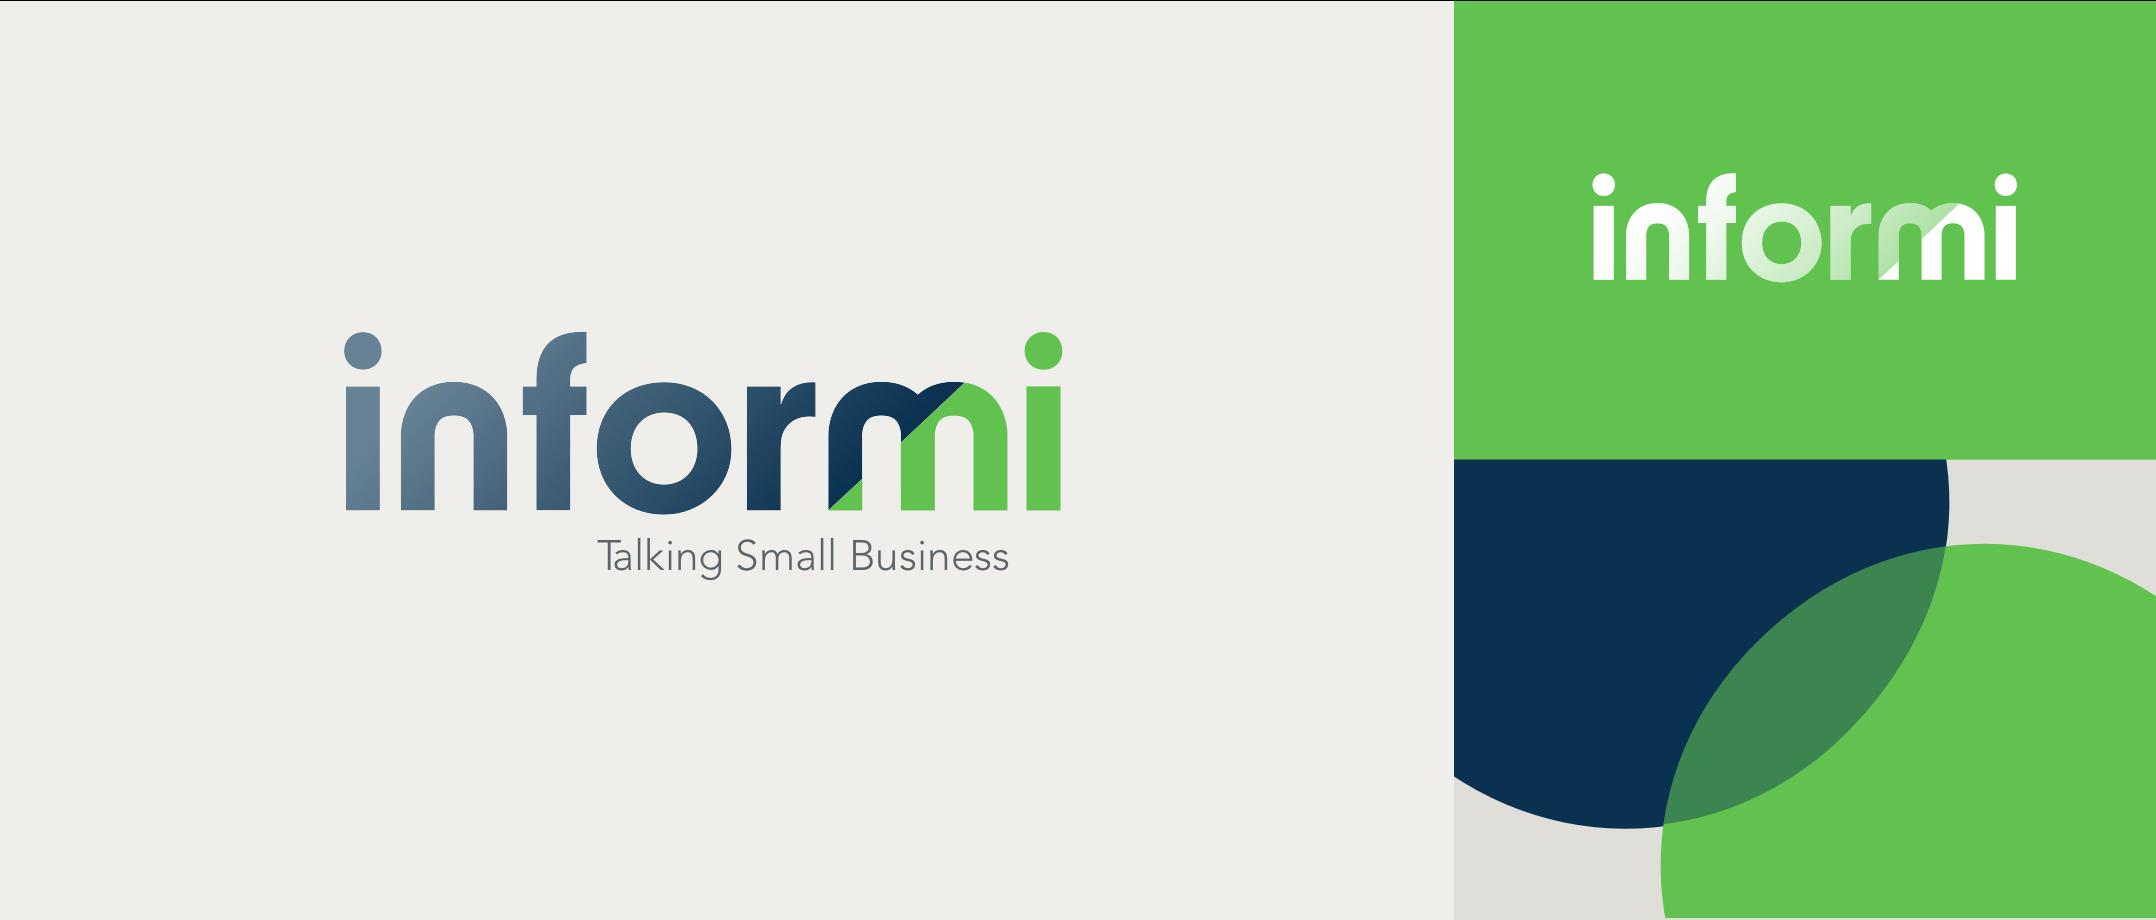 Inform logo & pattern